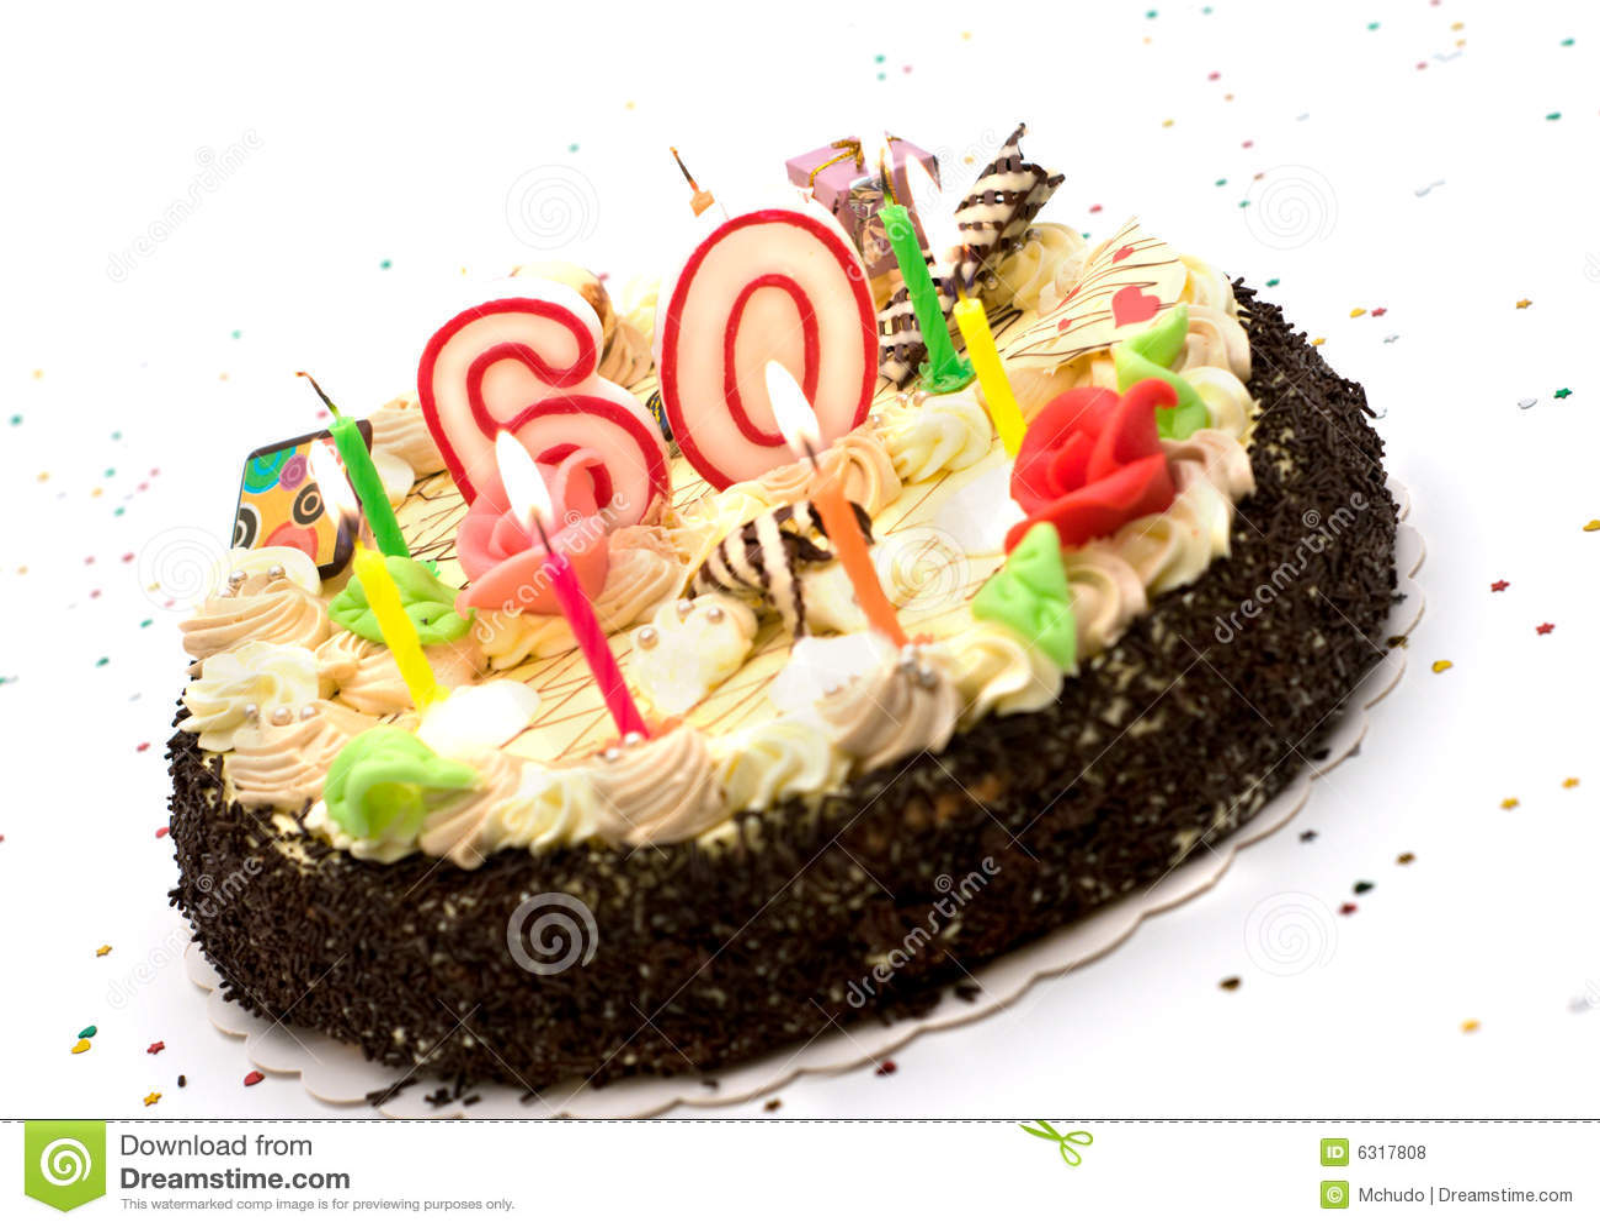 Birthday Cake For 60 Years Jubilee